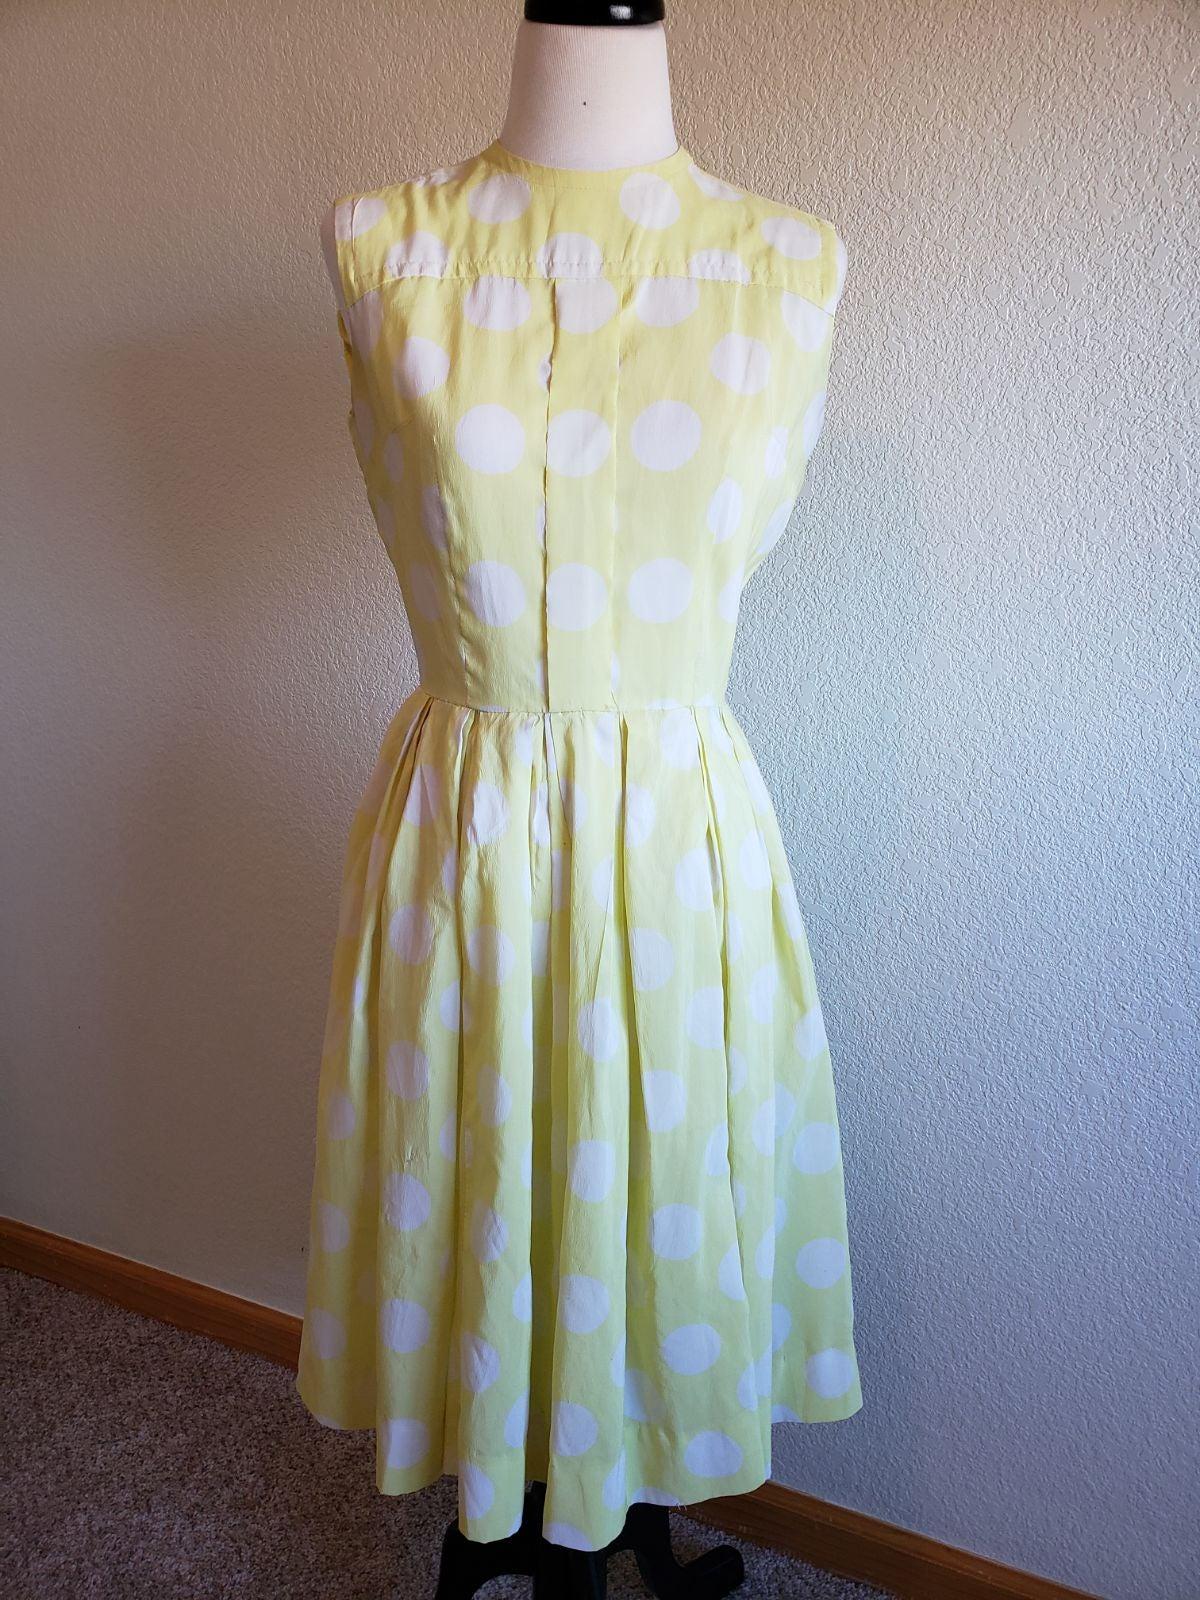 1950s vintage yellow polka dot dress